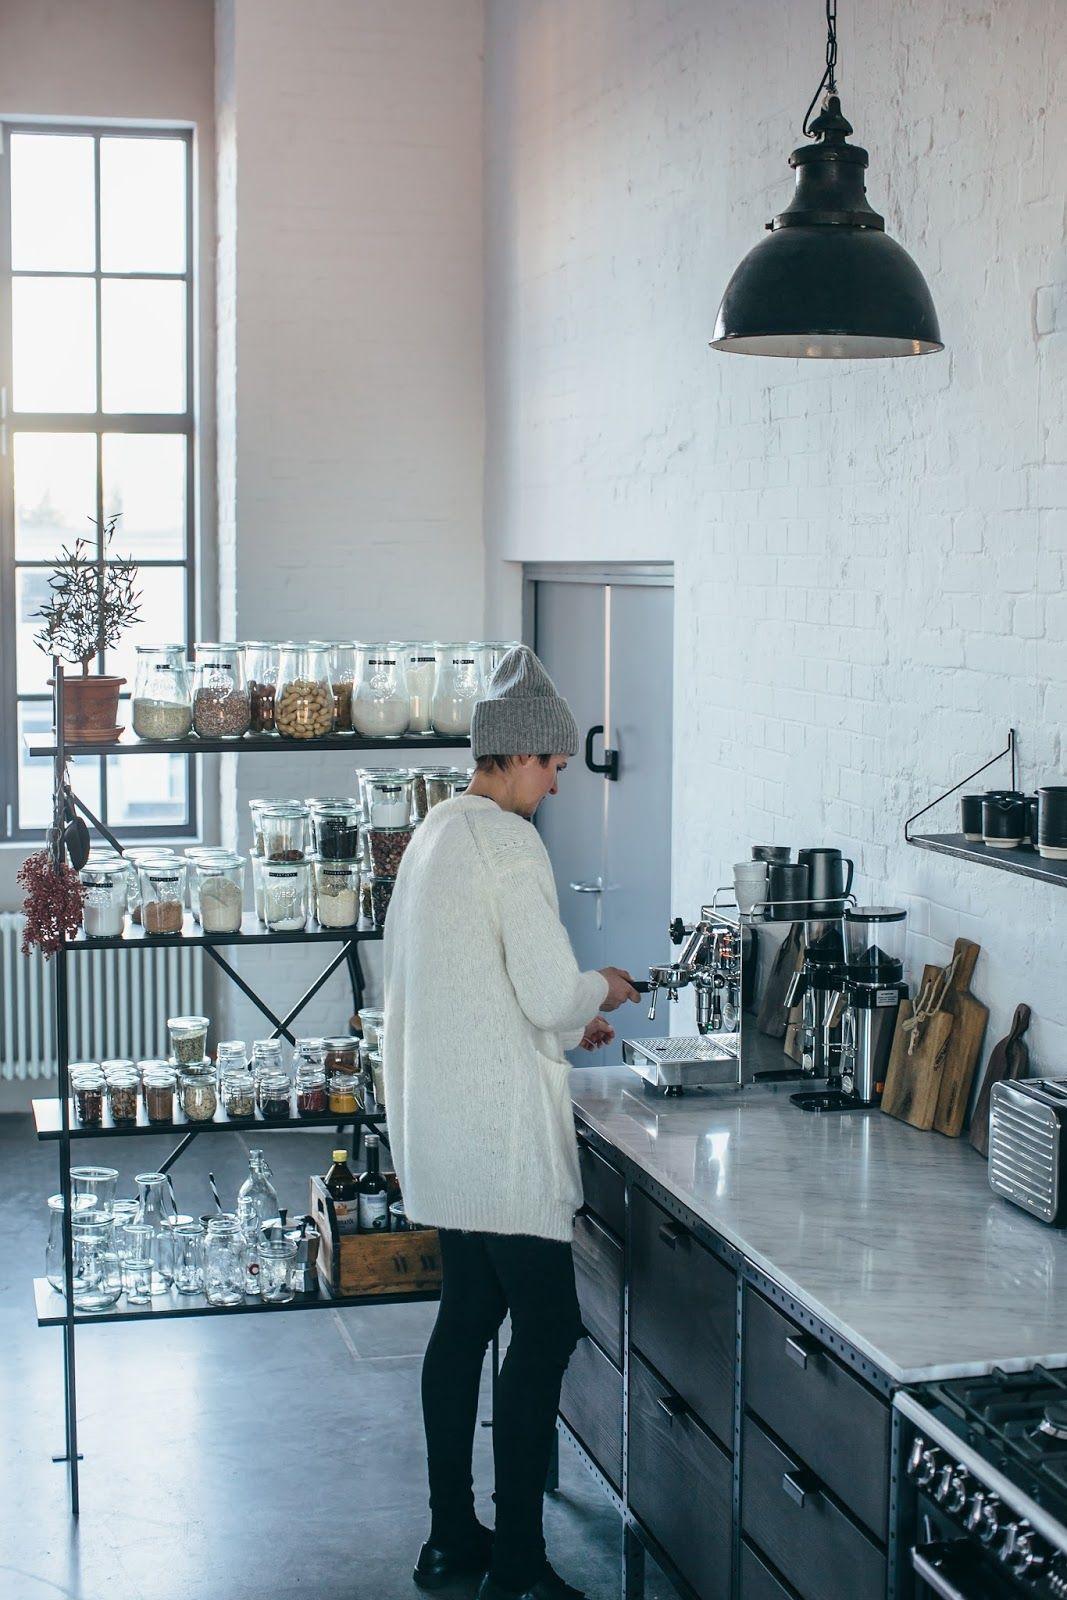 Frama Studio Kitchen Douglas Fir Cabinets Berlin Our Food Stories ...